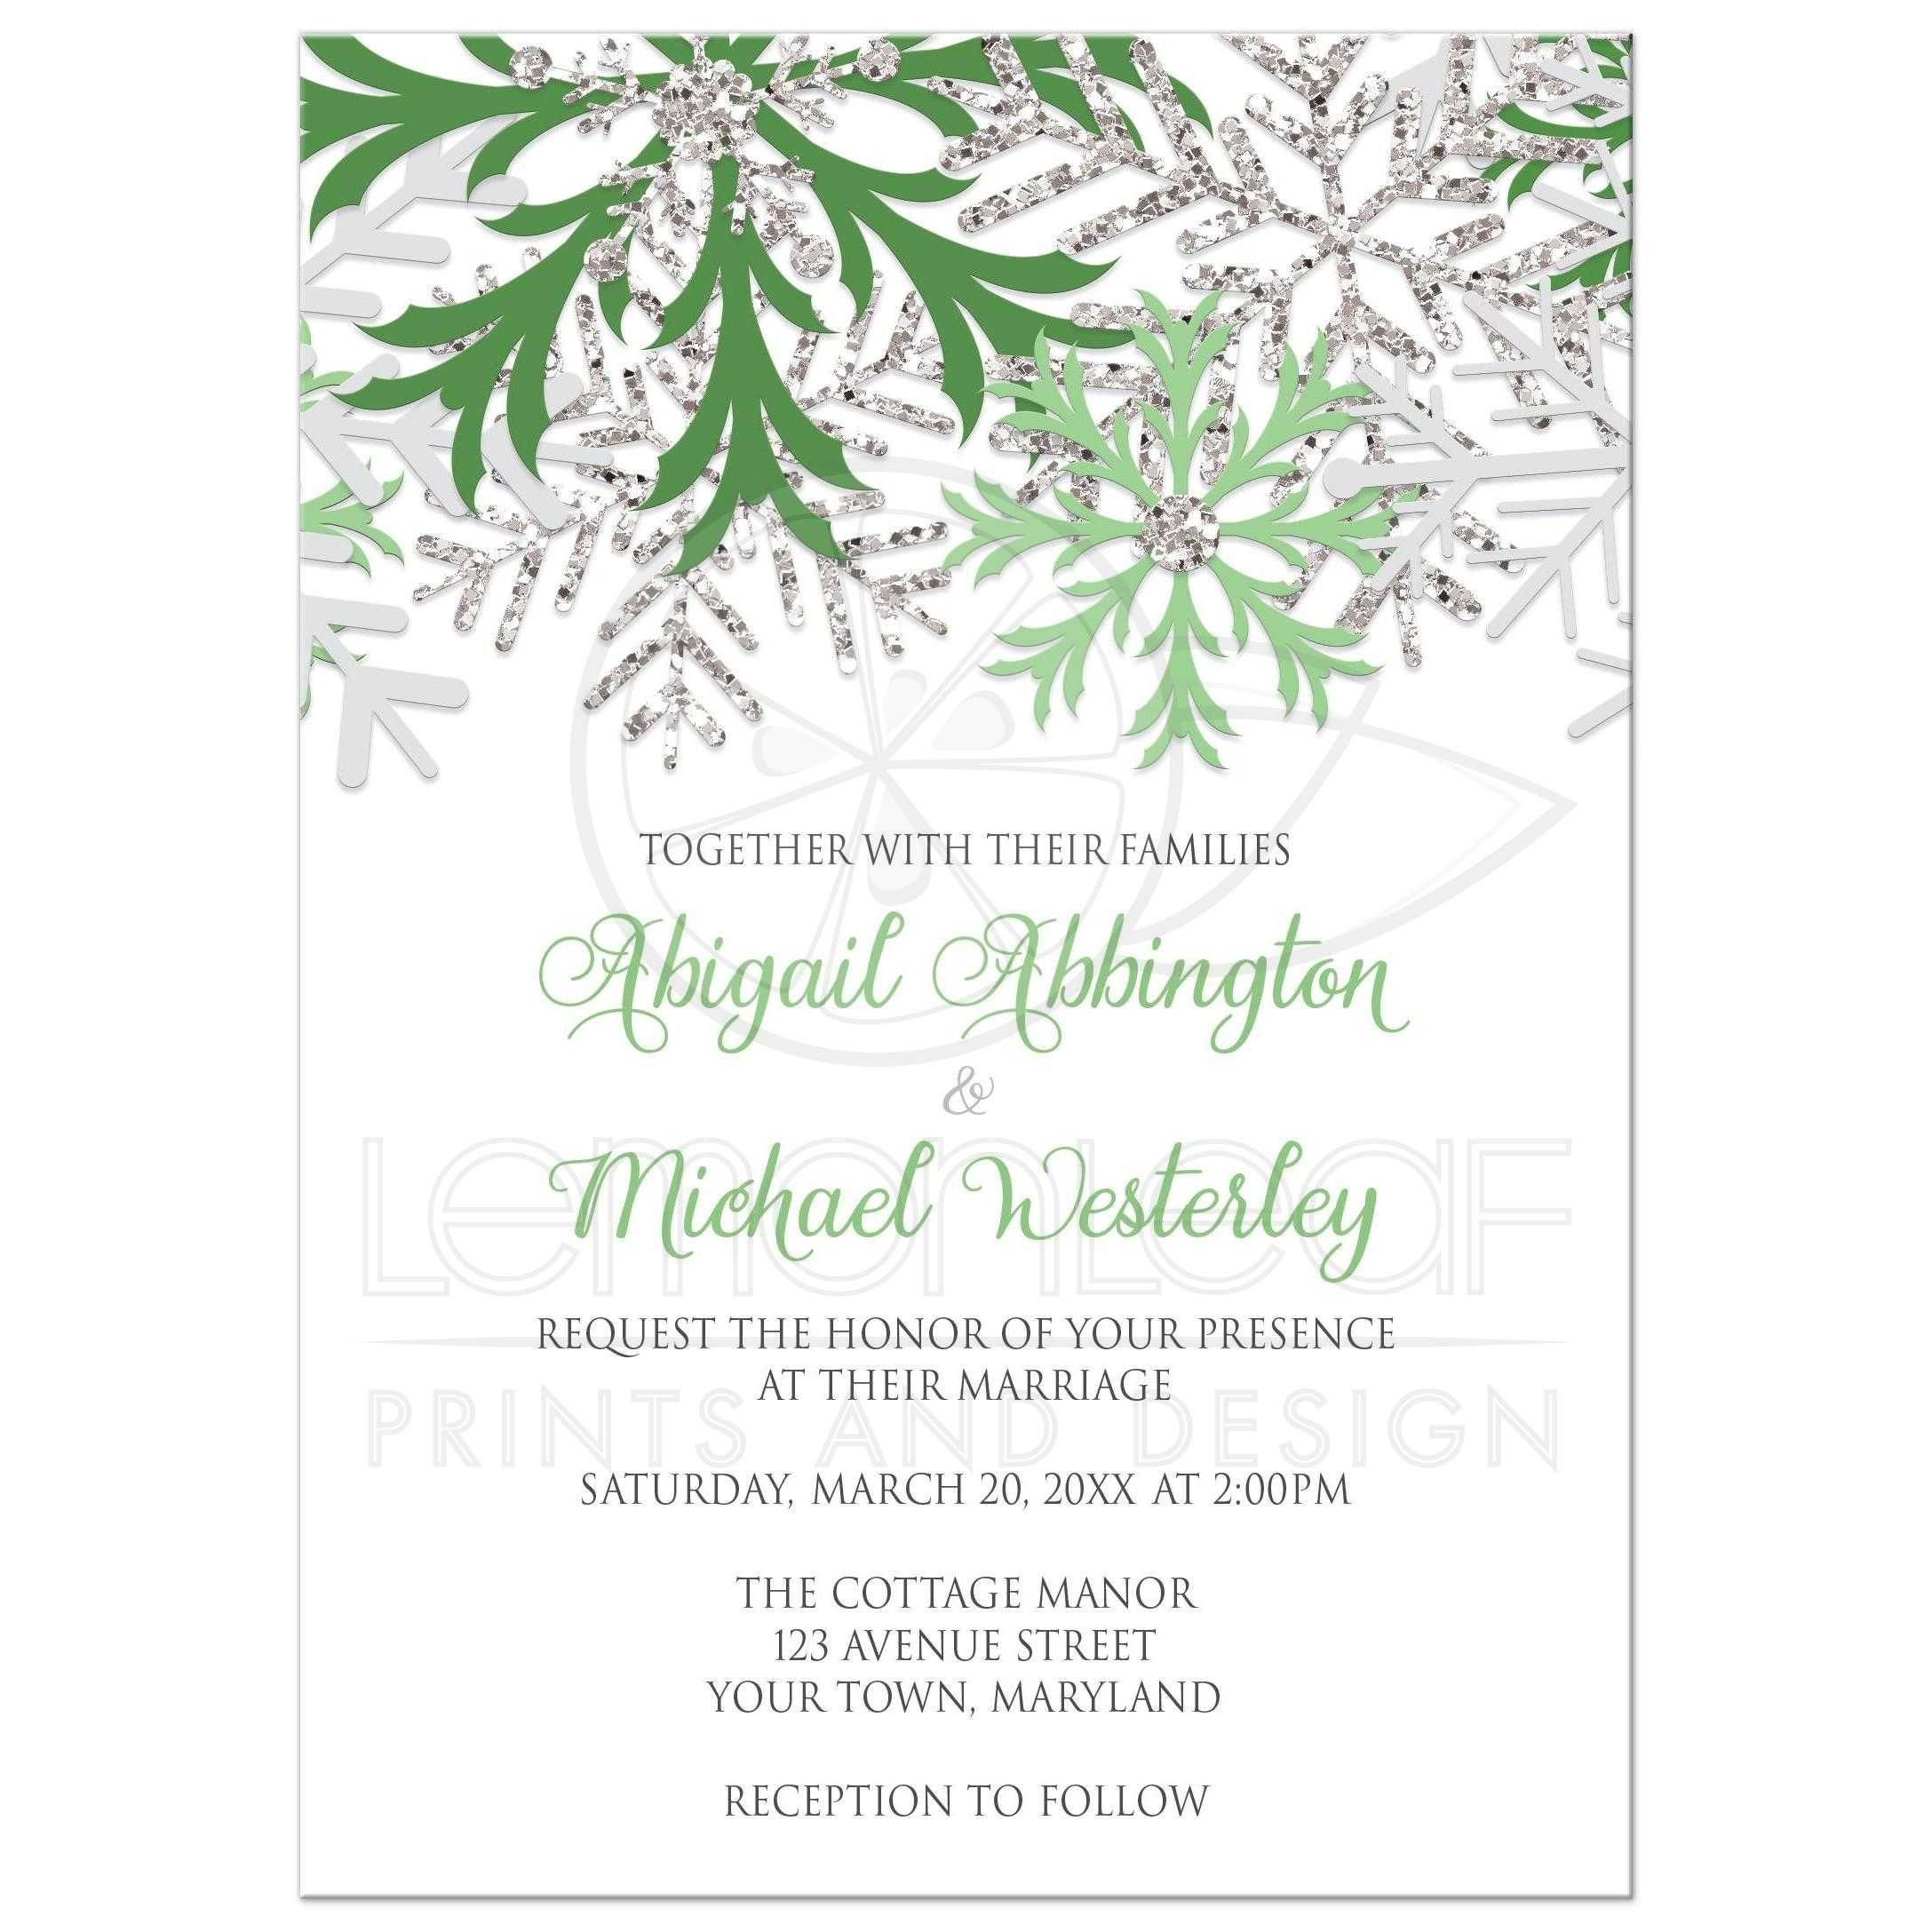 Wedding Invitations - Winter Snowflake Green Silver | Winter wedding ...